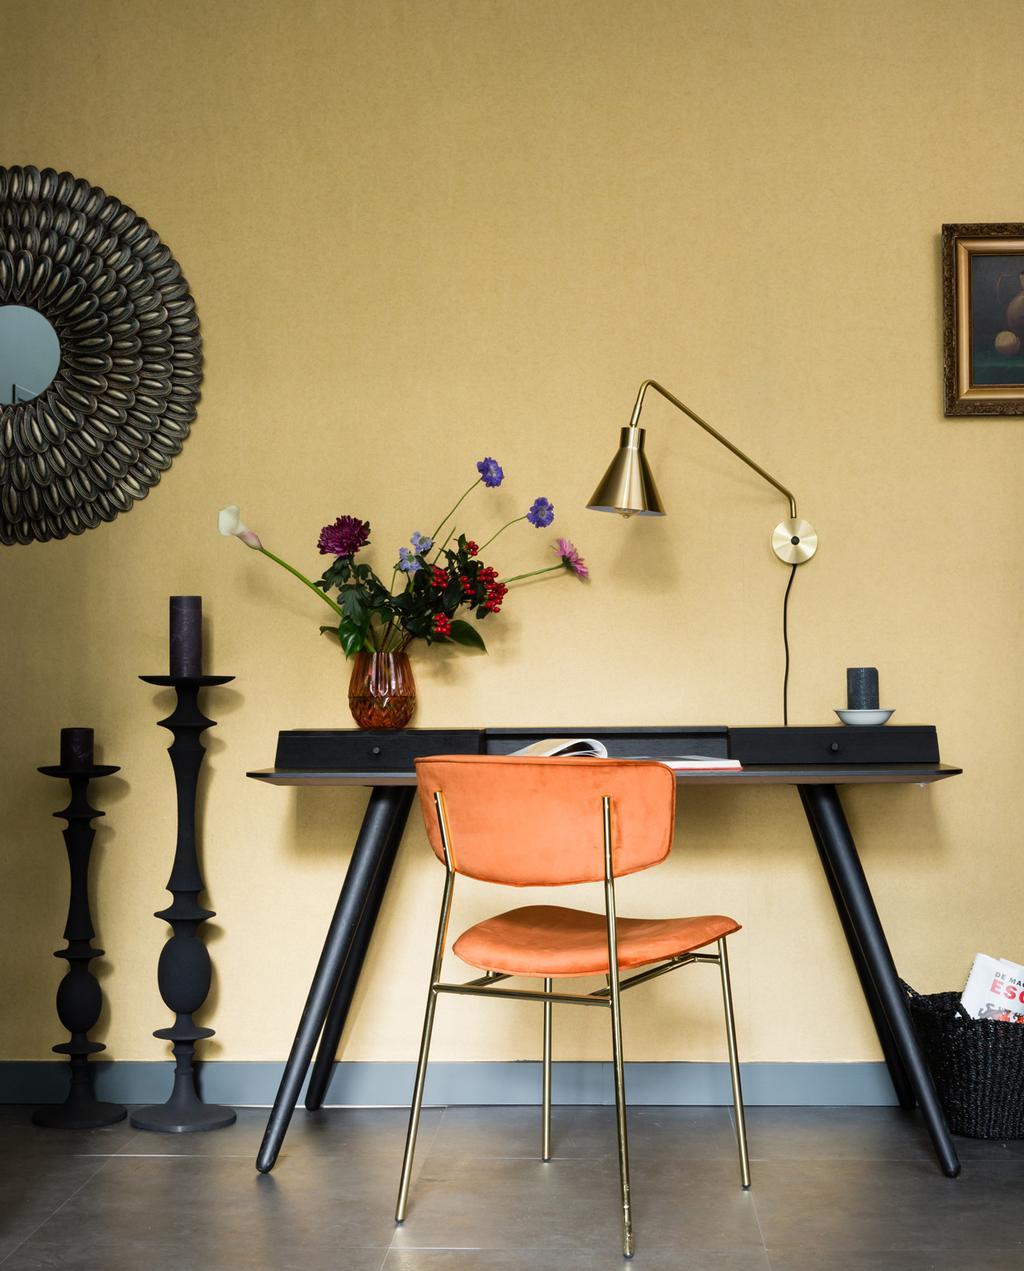 vtwonen weer verliefd op je huis | seizoen 11 aflevering 5 | fotografie Barbara Kieboom | styling Frans Uyterlinde